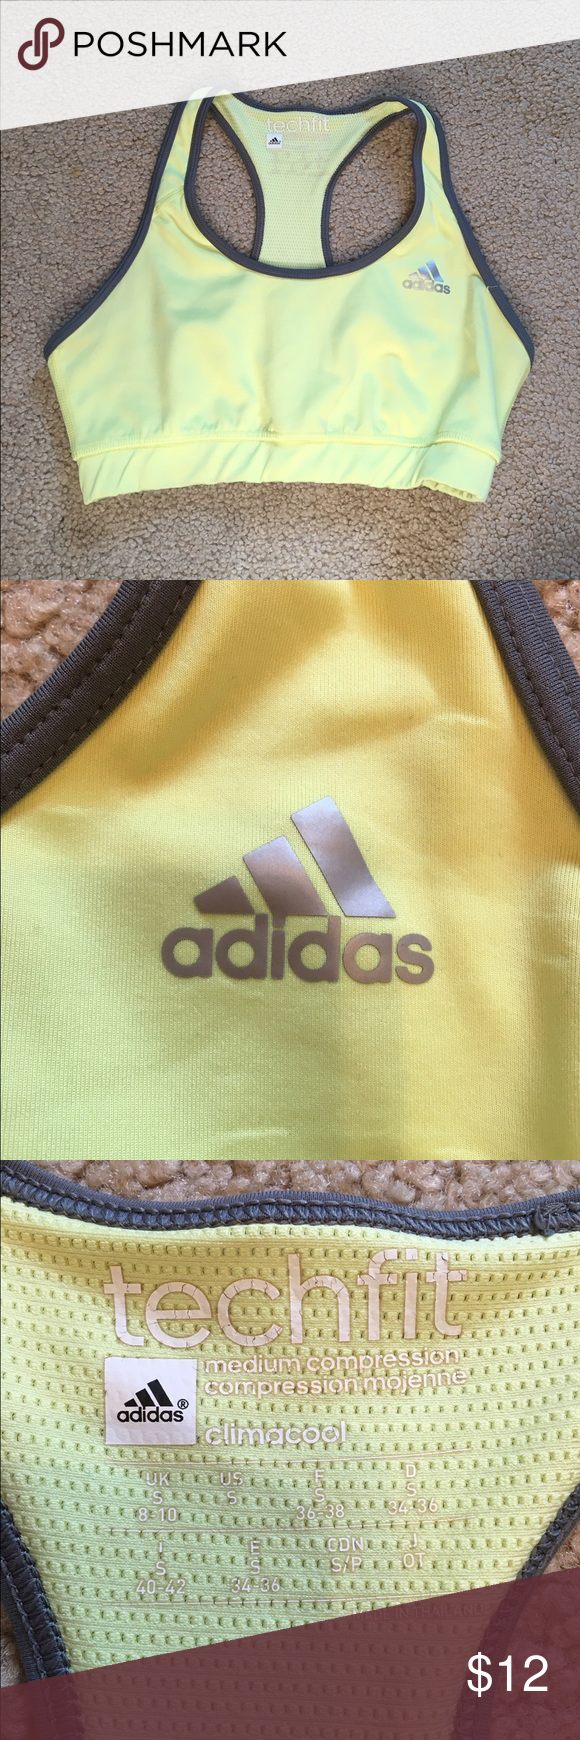 Adidas sports bra Lemon yellow adidas sports bra Adidas Intimates & Sleepwear Bras